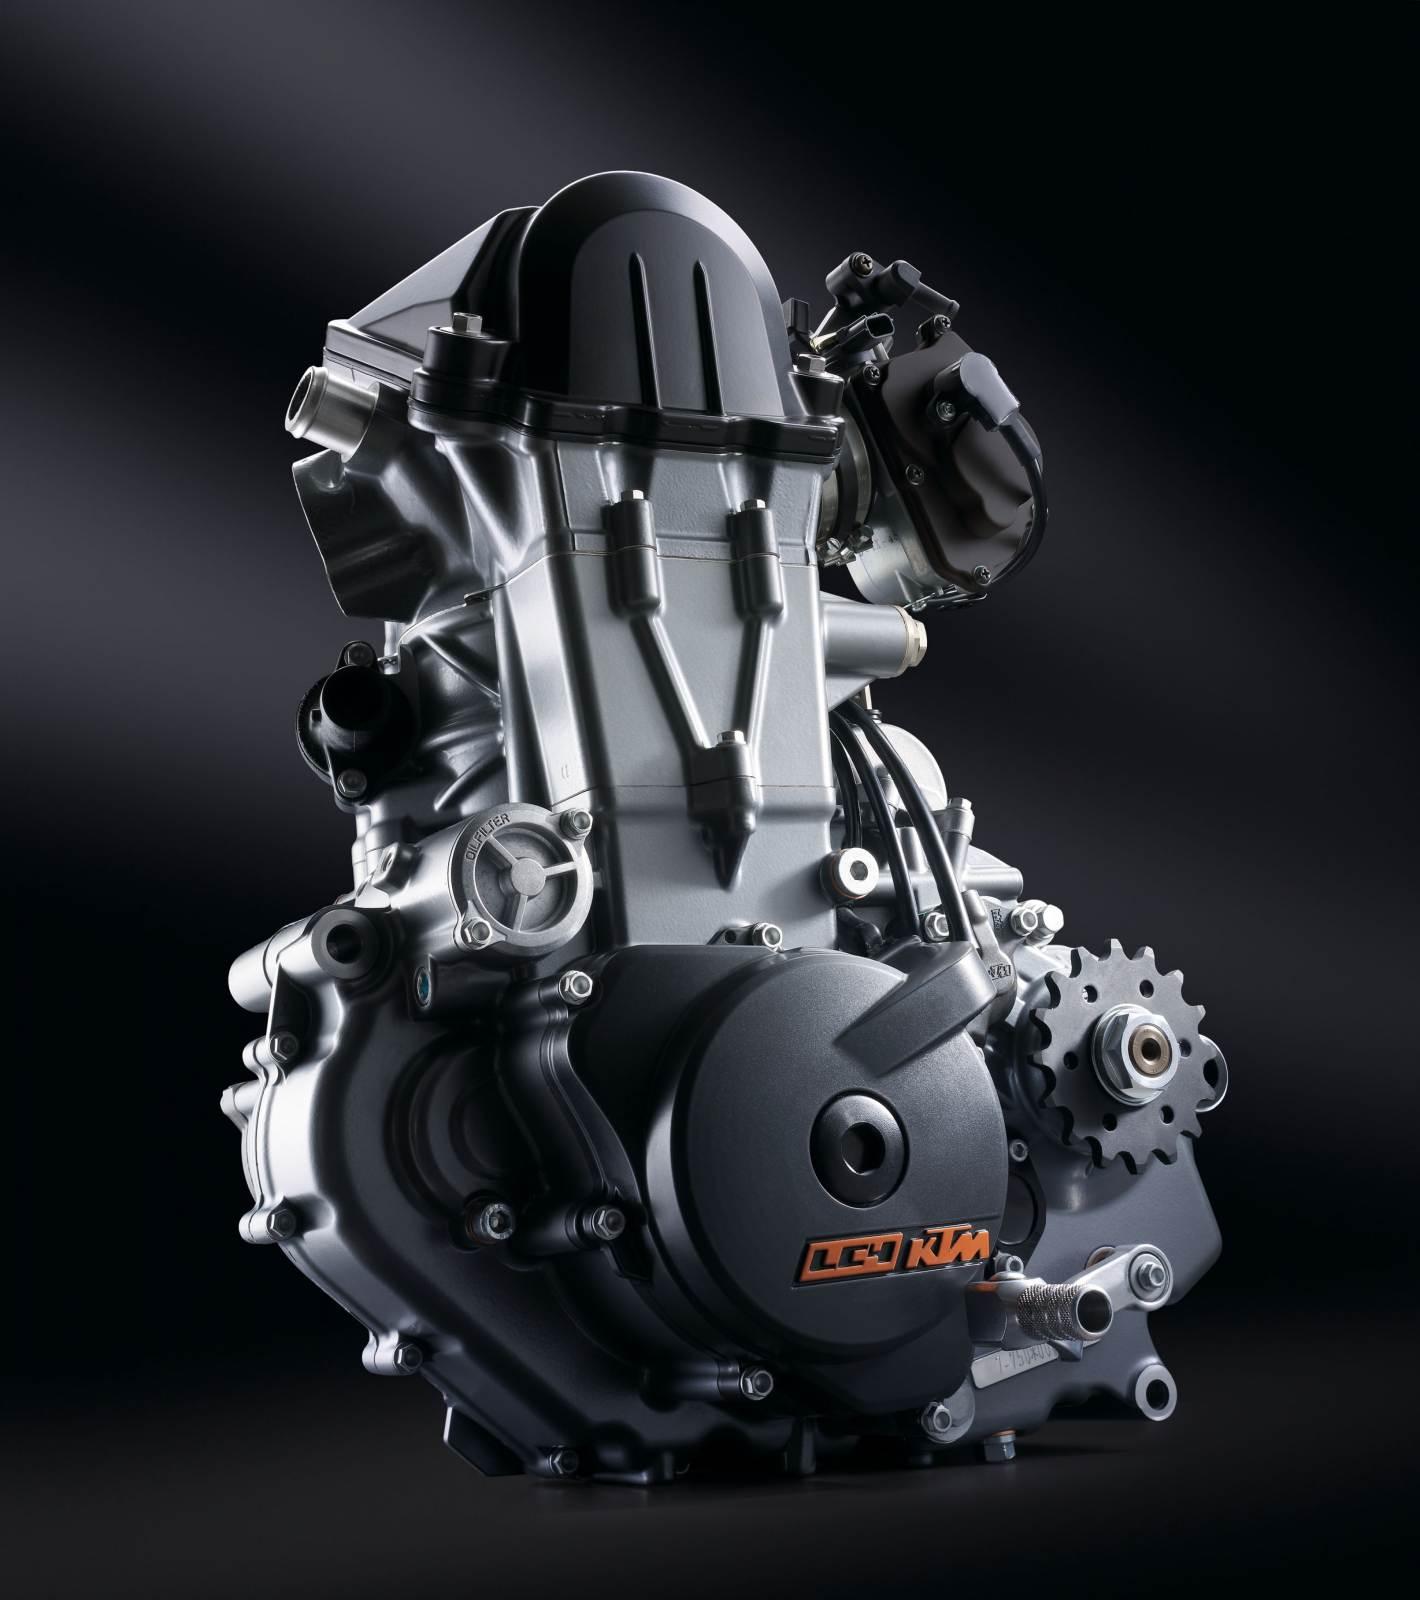 KTM LC4 690